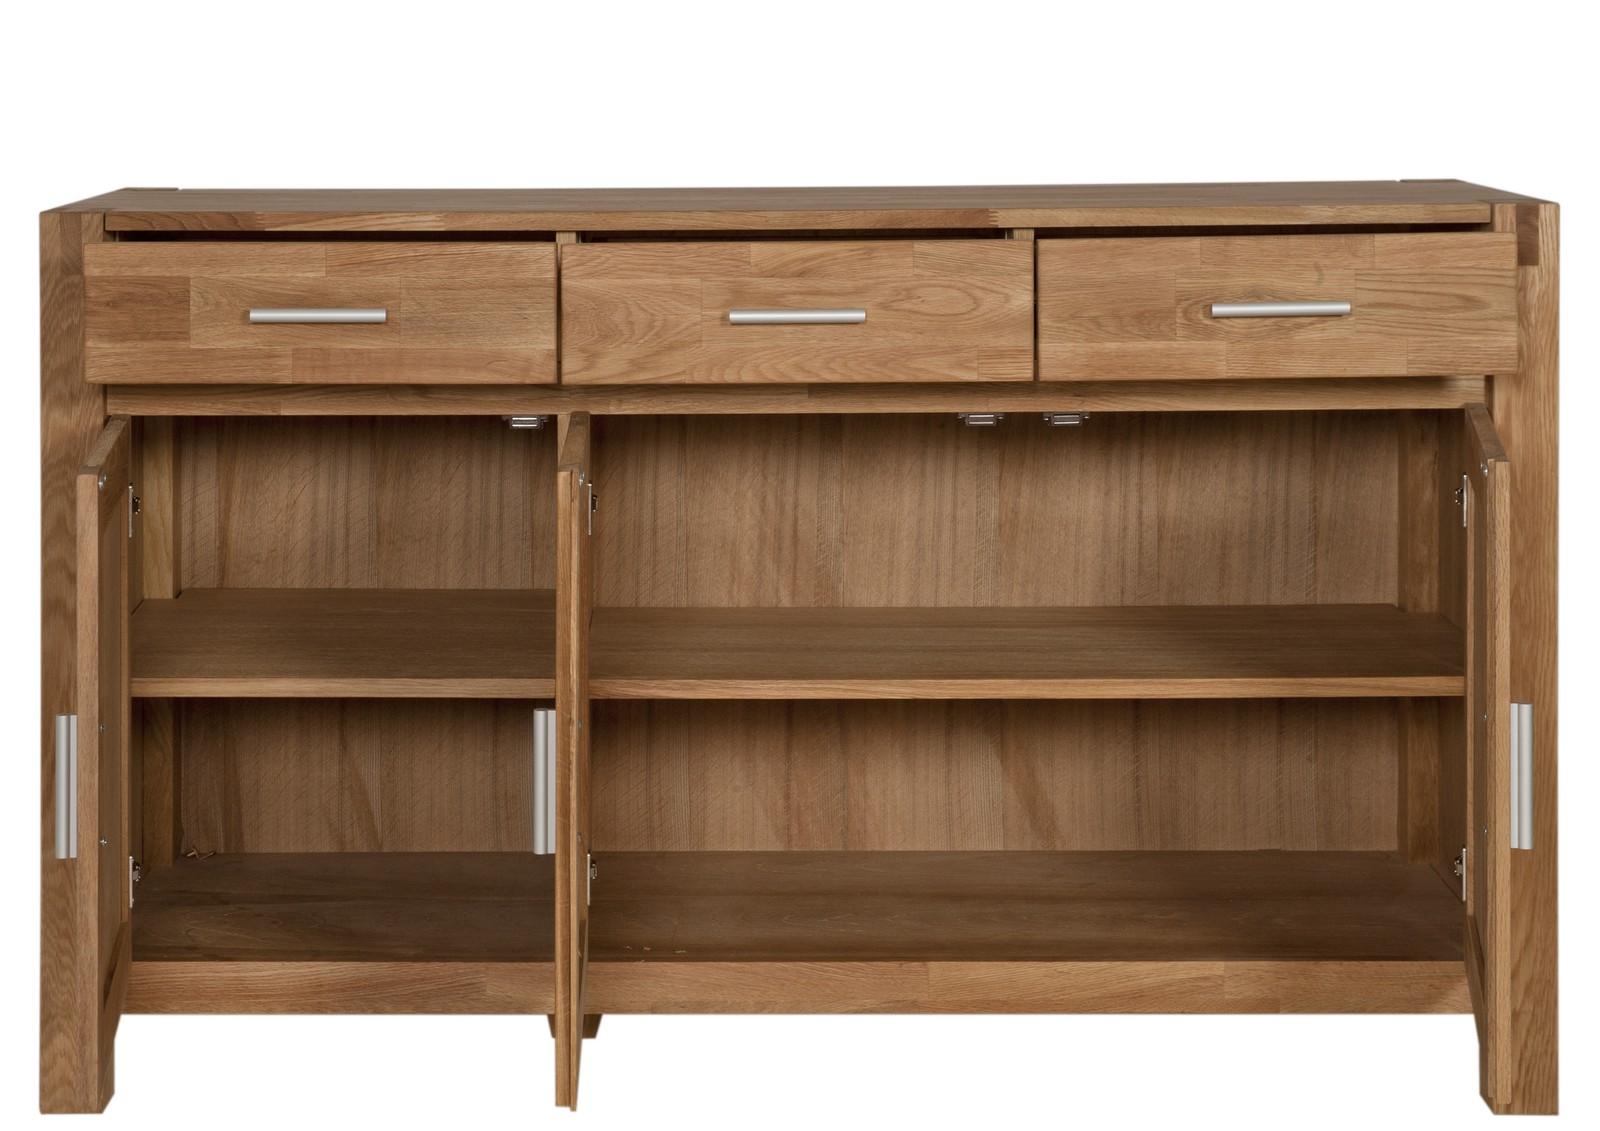 sam sideboard eiche teilmassiv 140 cm sit okay 3803 01 auf lager. Black Bedroom Furniture Sets. Home Design Ideas